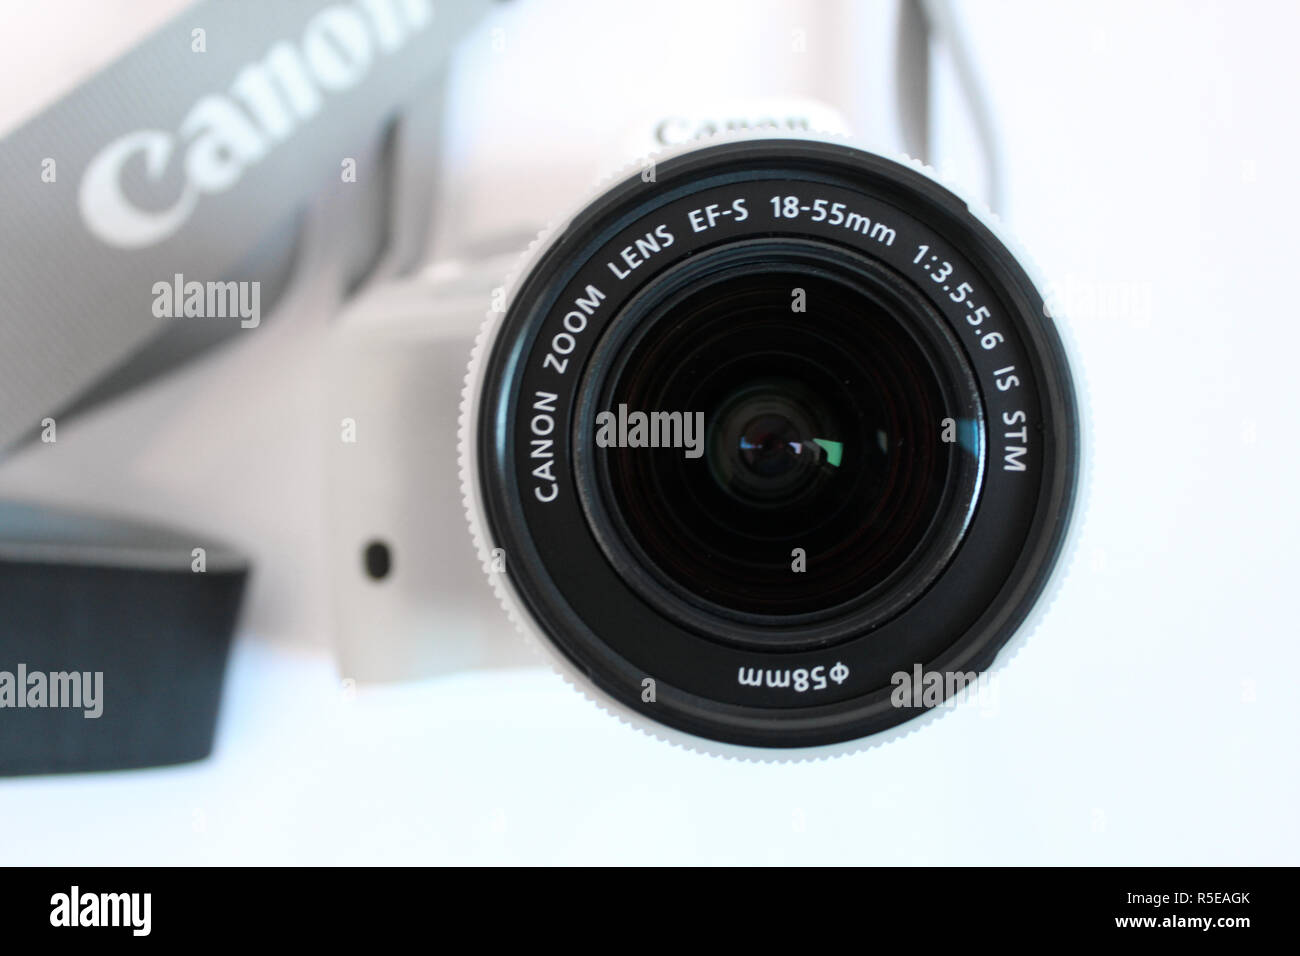 Camera Canon 100d eos, lens efs 18-55mm, editorial, illustrative - Stock Image